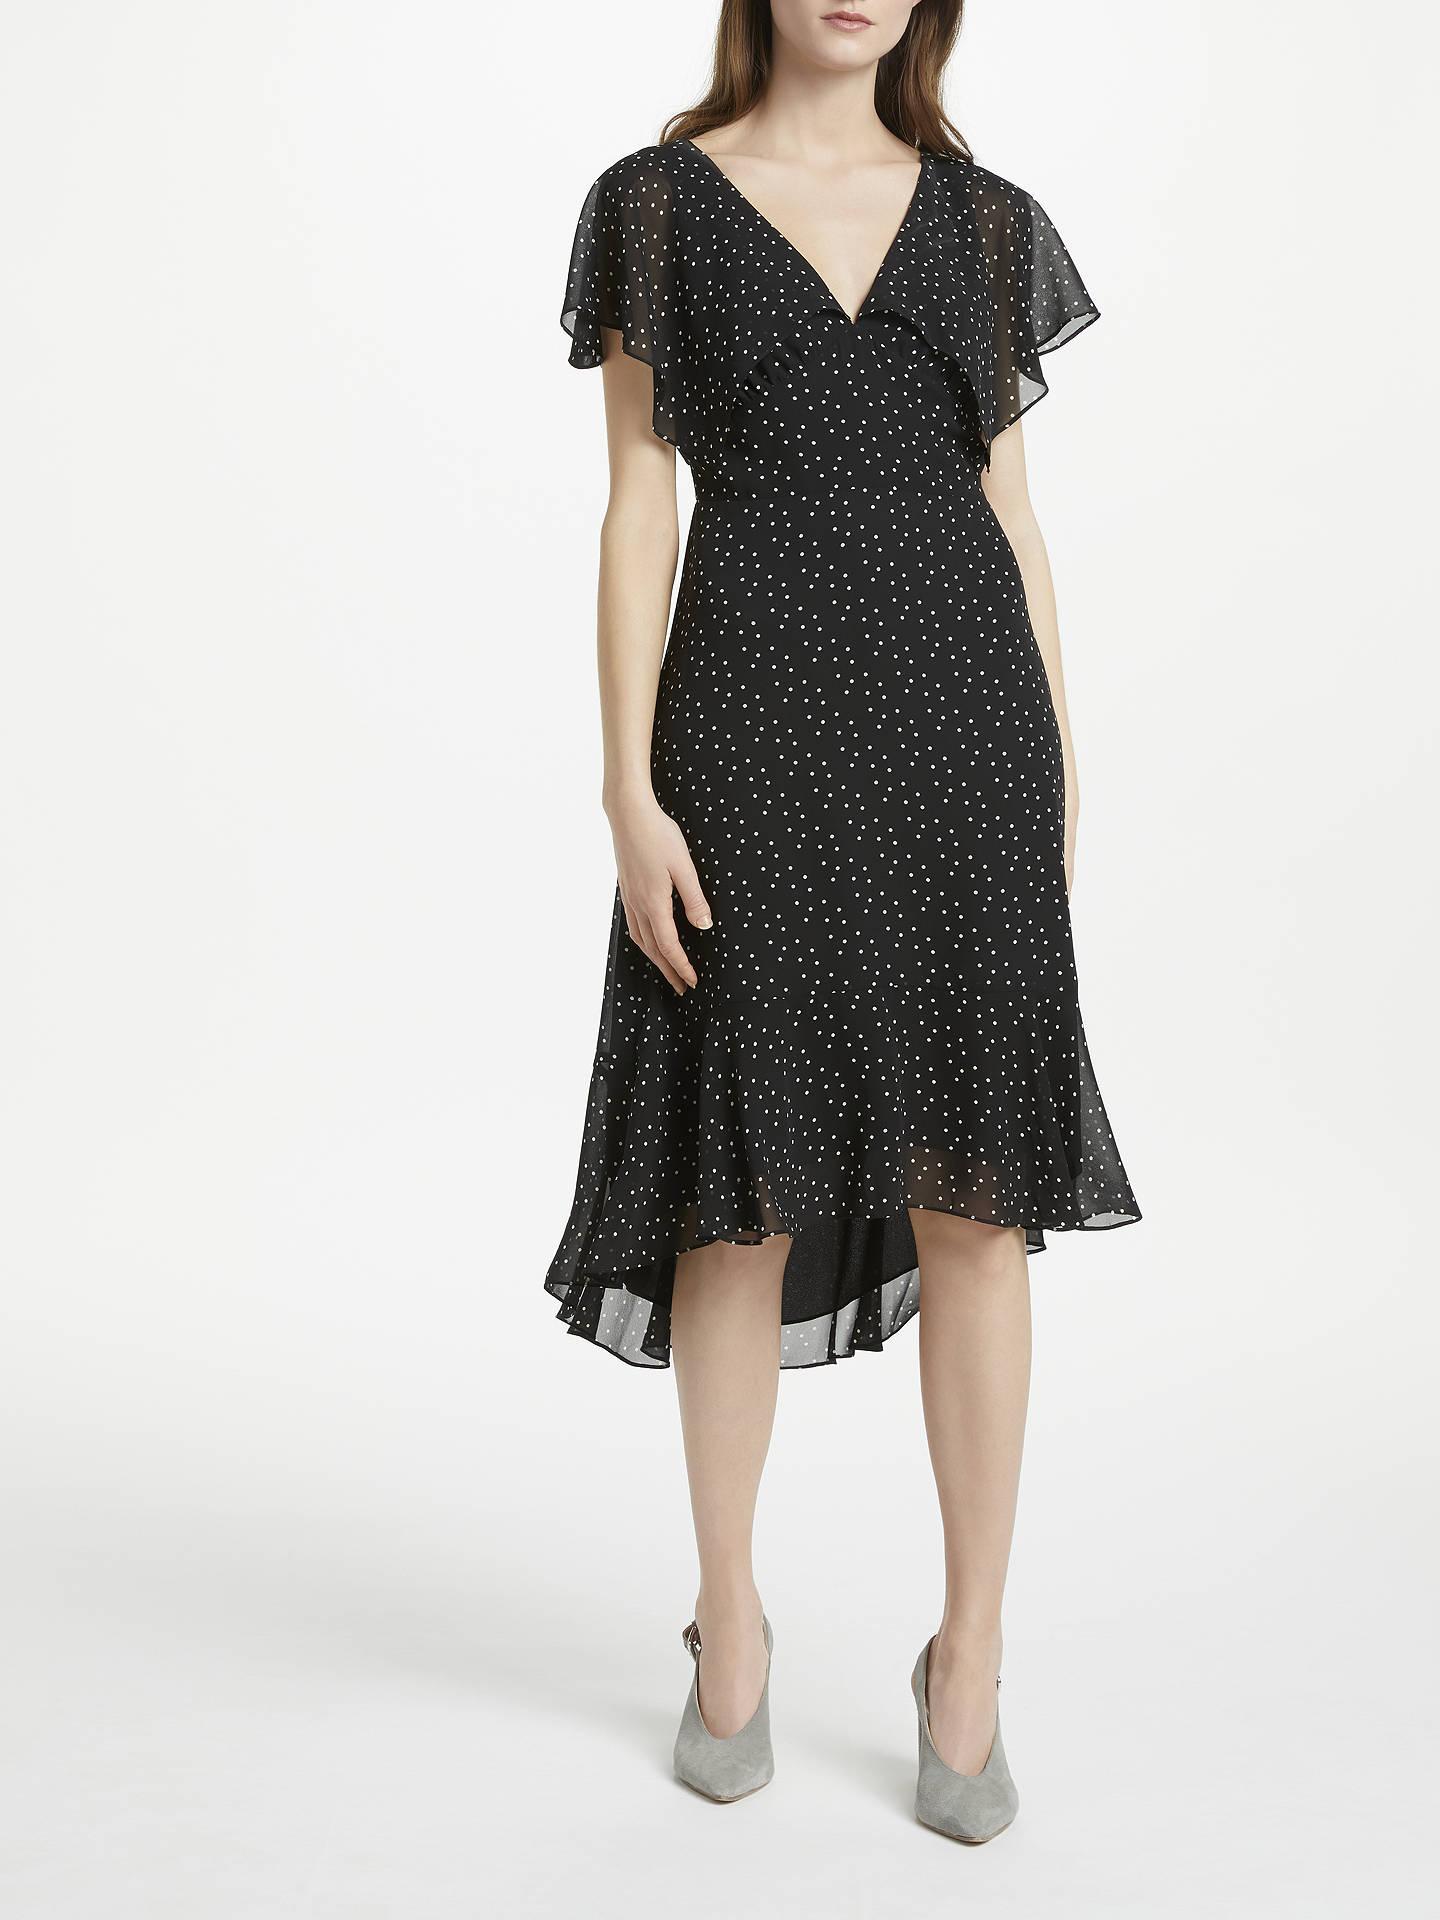 6834e1496cb2 Buy Max Studio Spot Print Georgette Dress